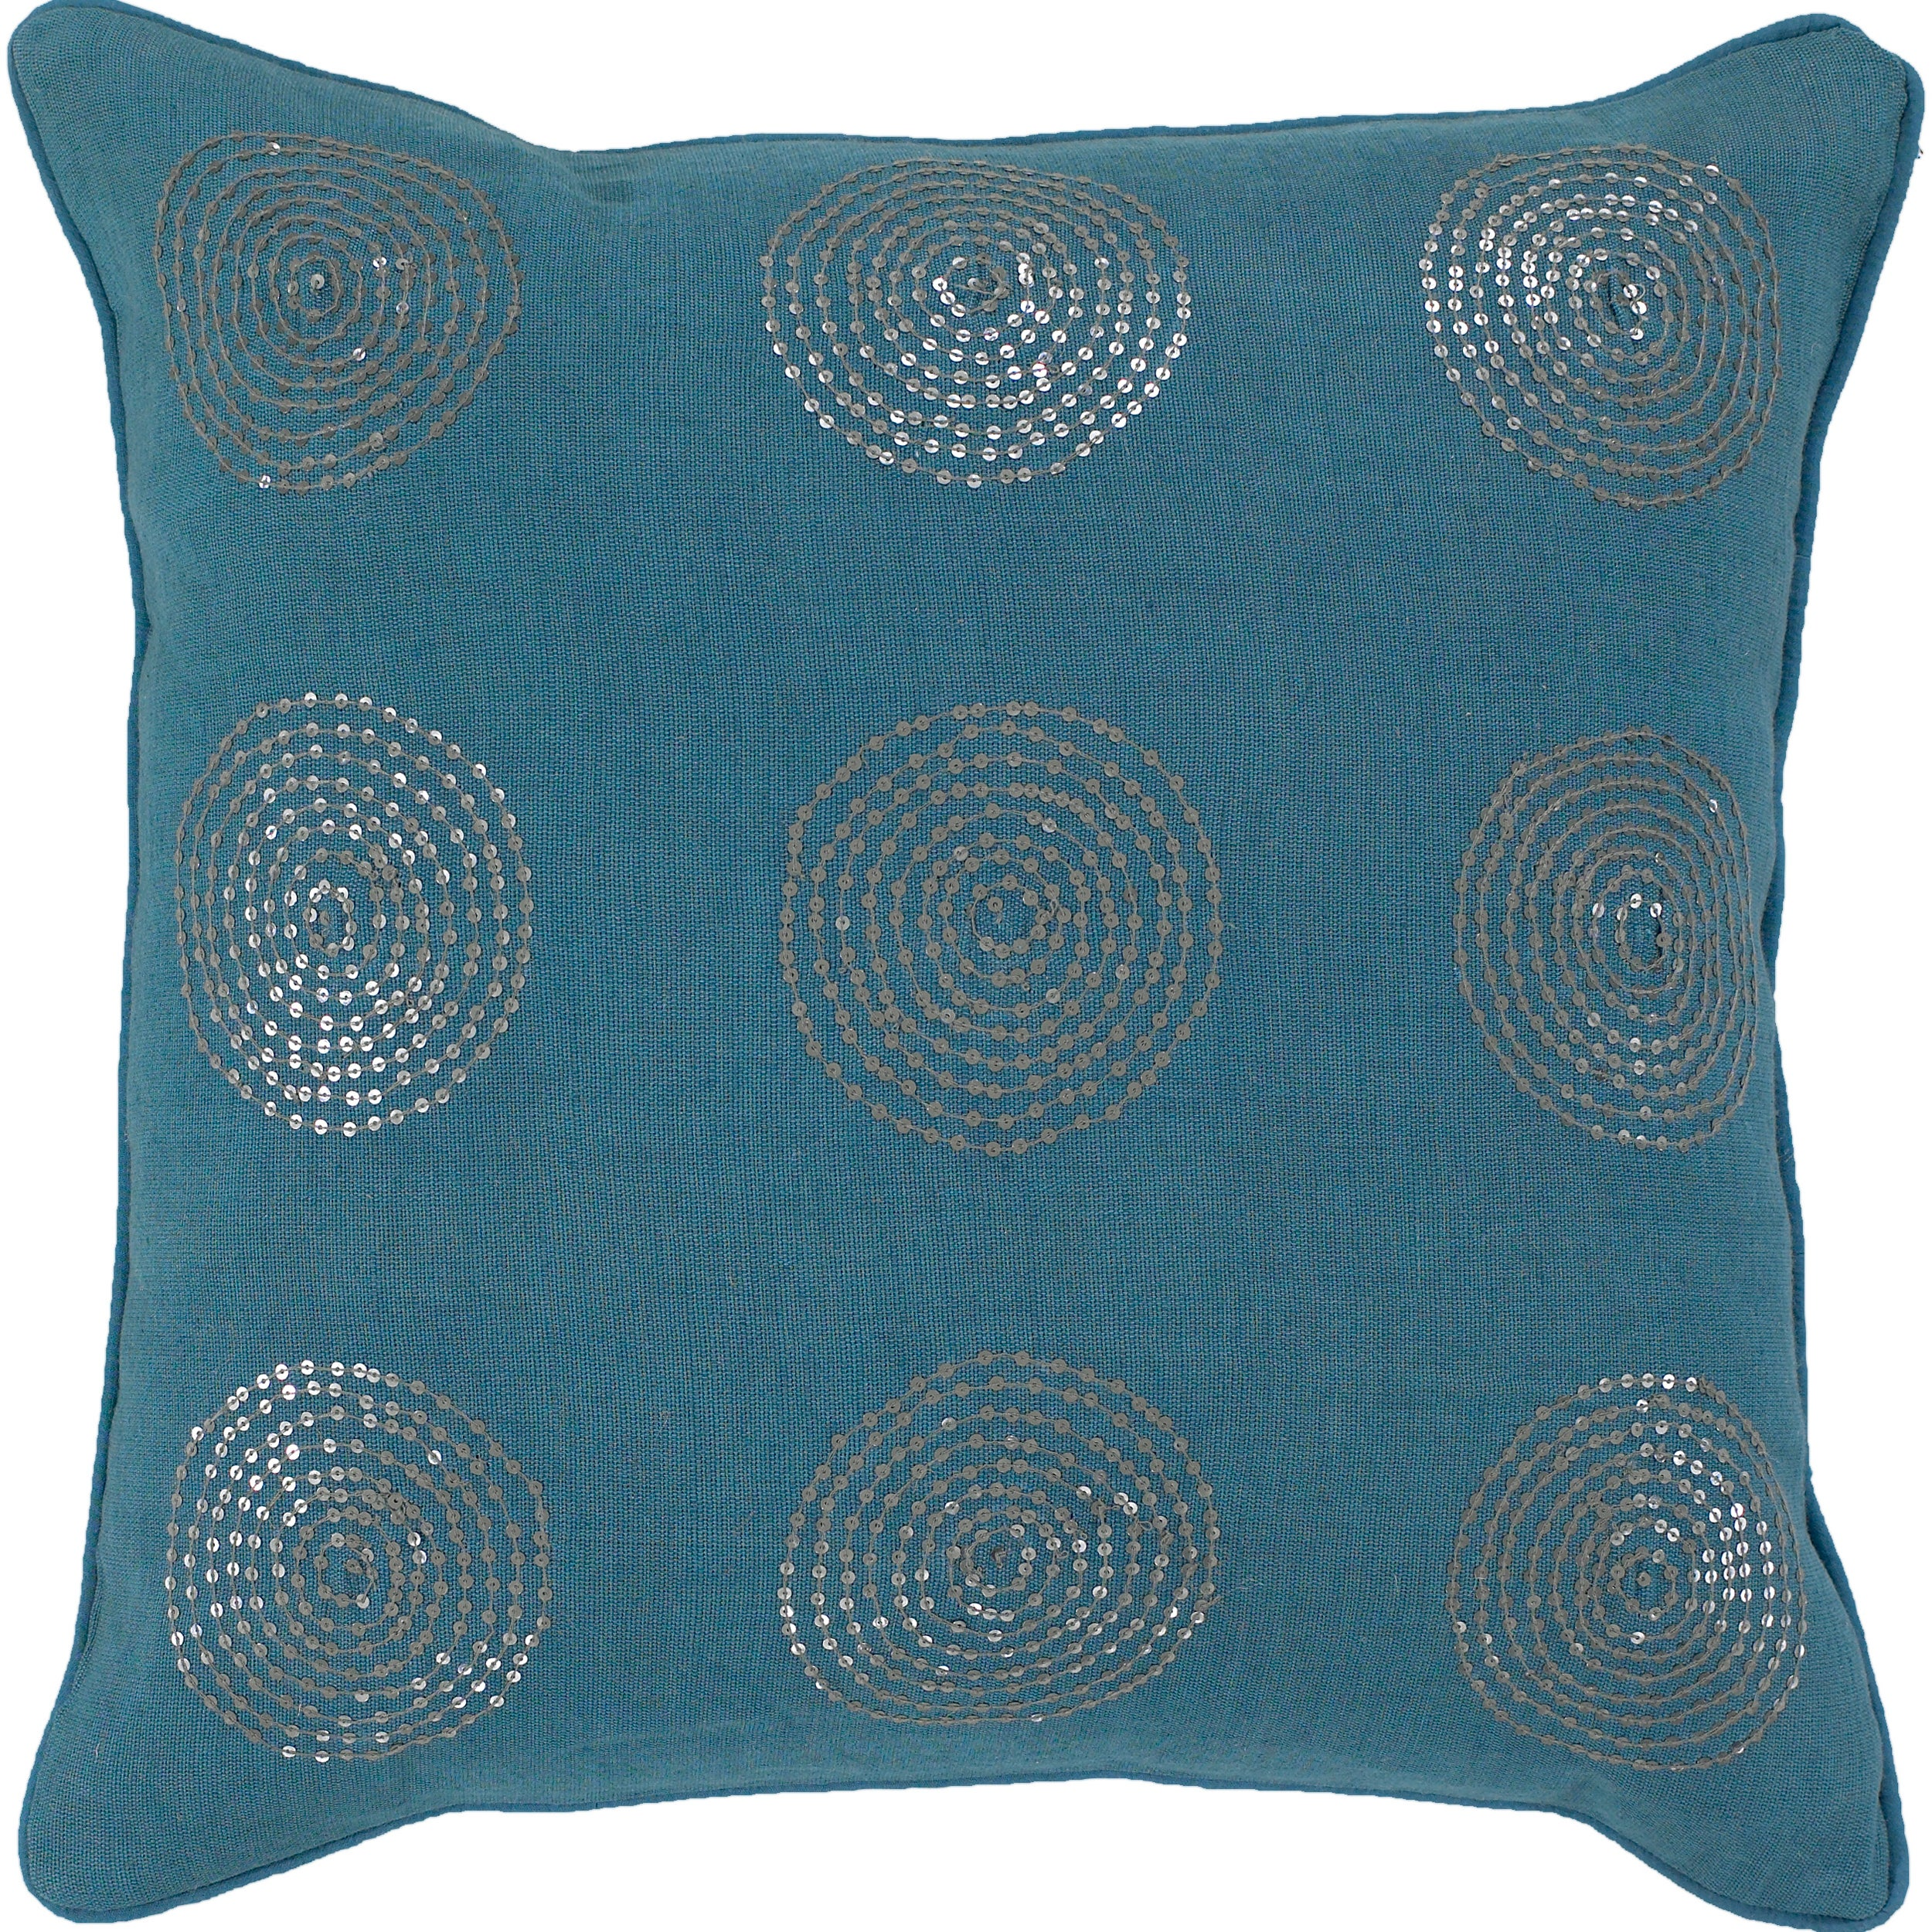 Decorative Feronia 18-inch Down Pillow